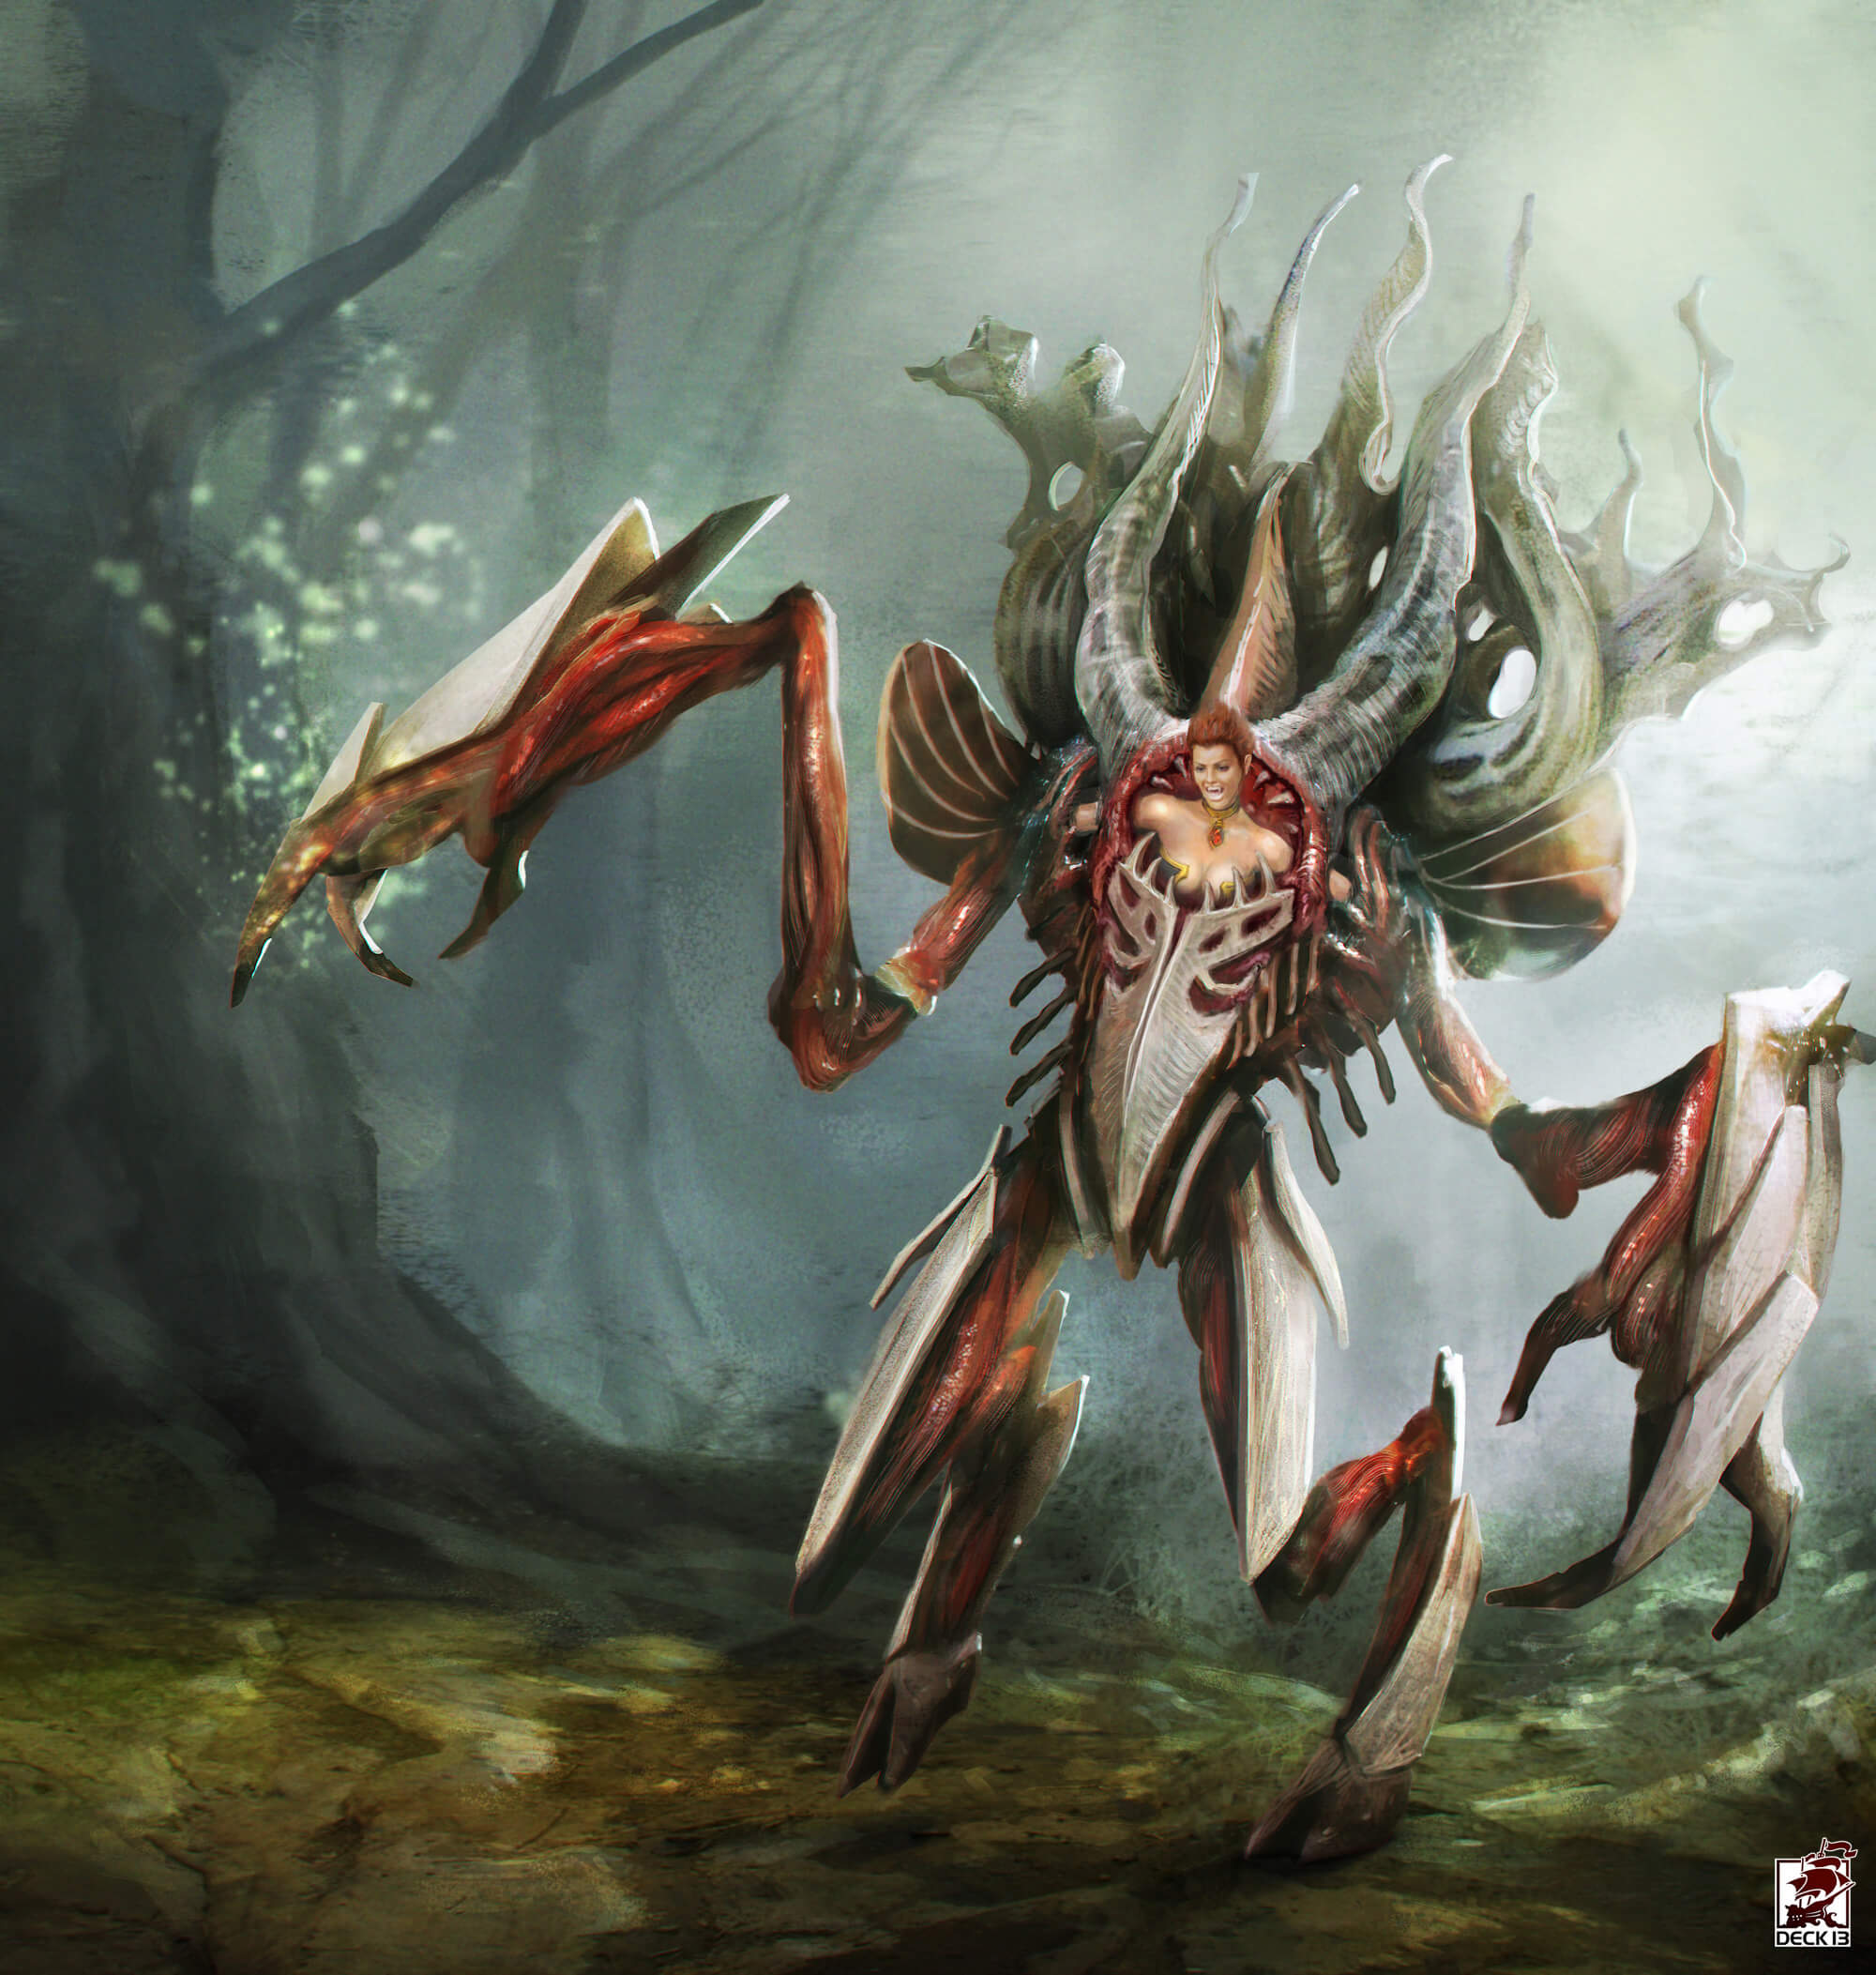 blood-knights-creature-concept-art-felix-haas-bloodfox_exoskelet_006b